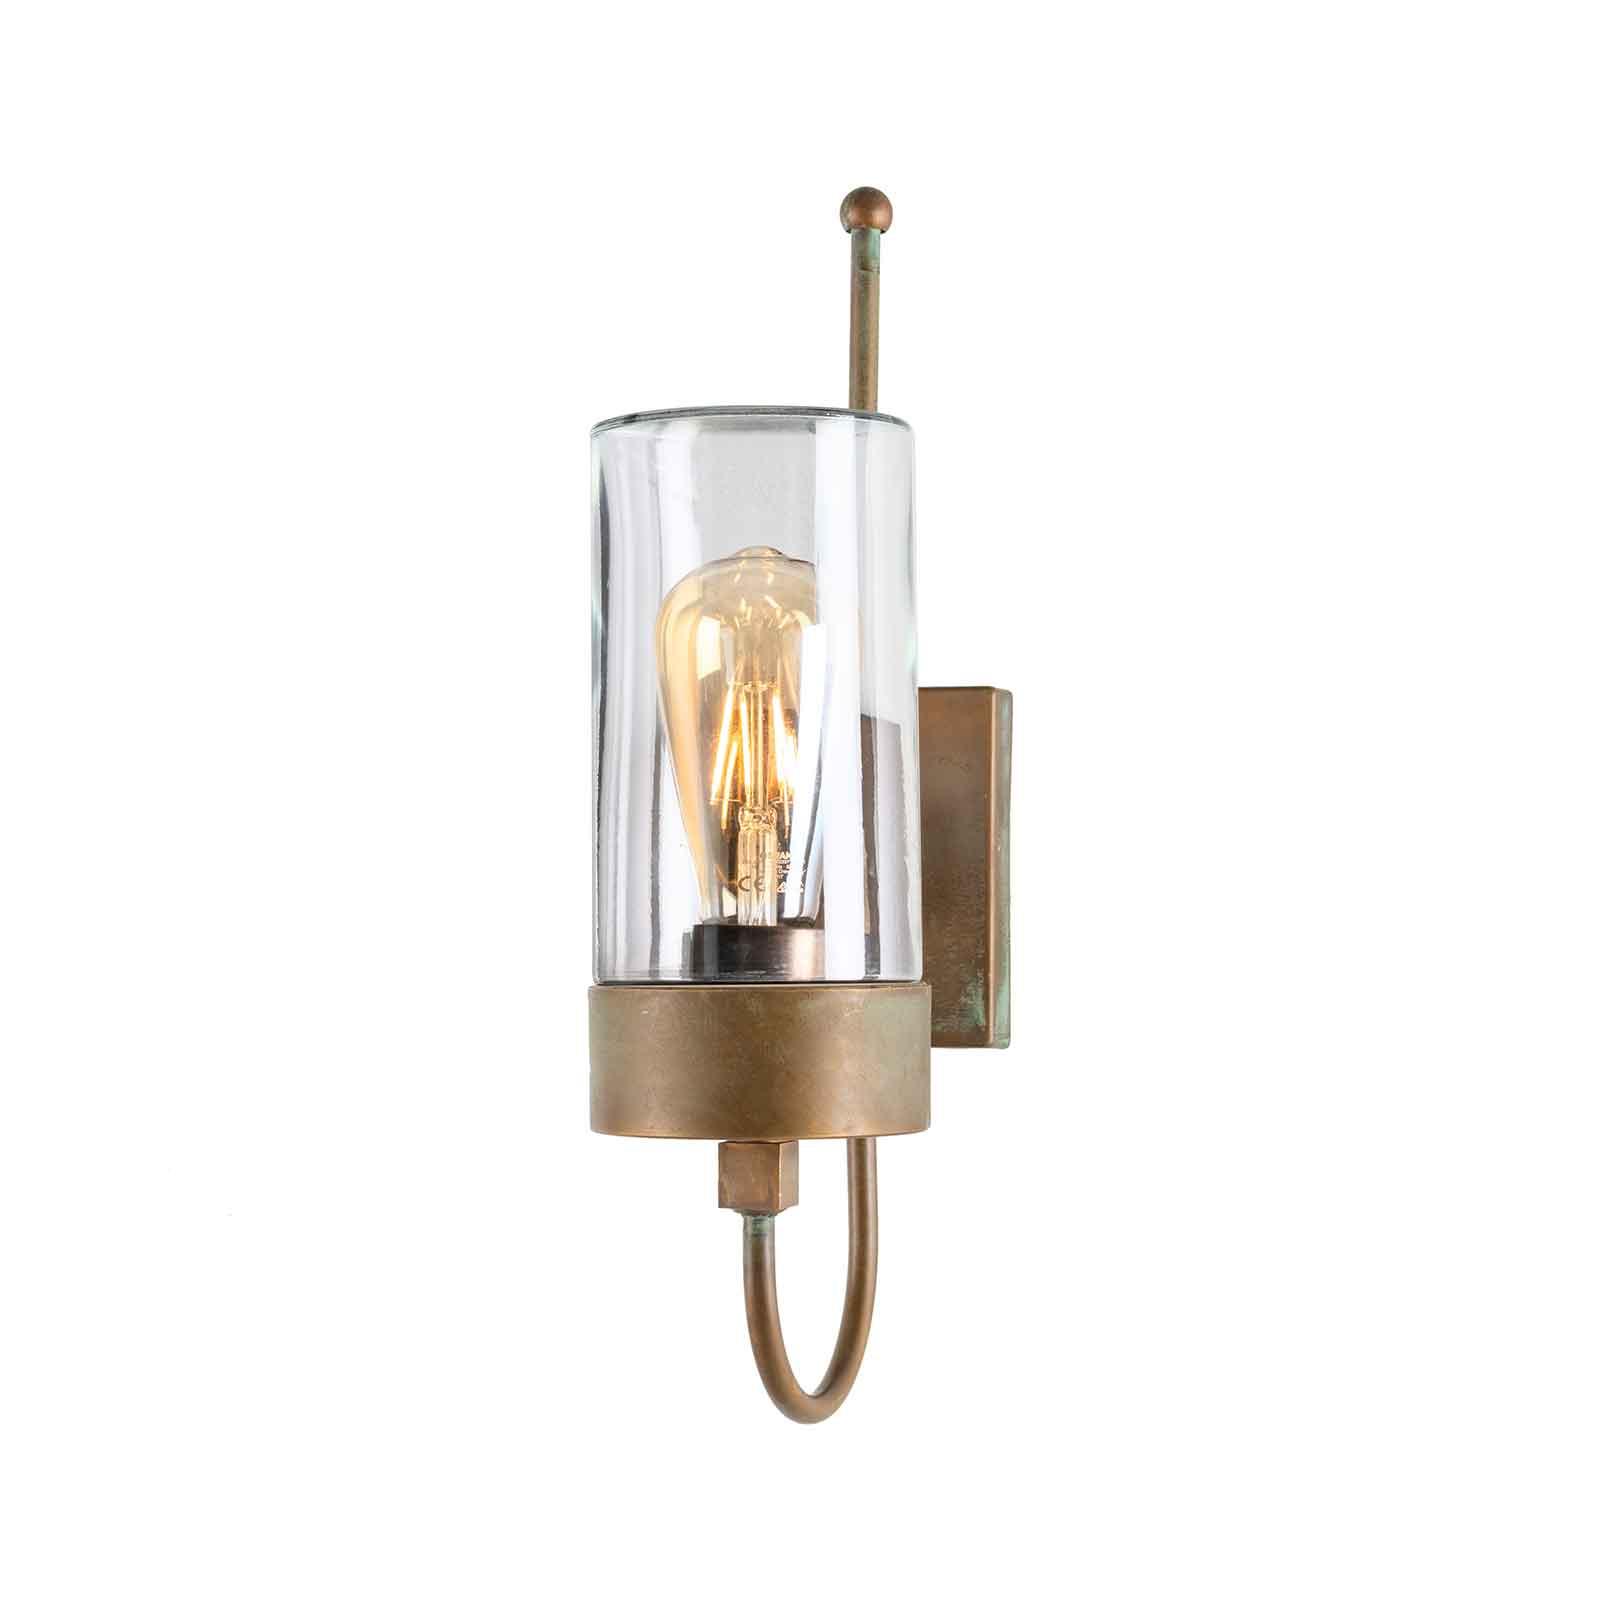 Buitenwandlamp Silindar 3356,messing antiek/helder